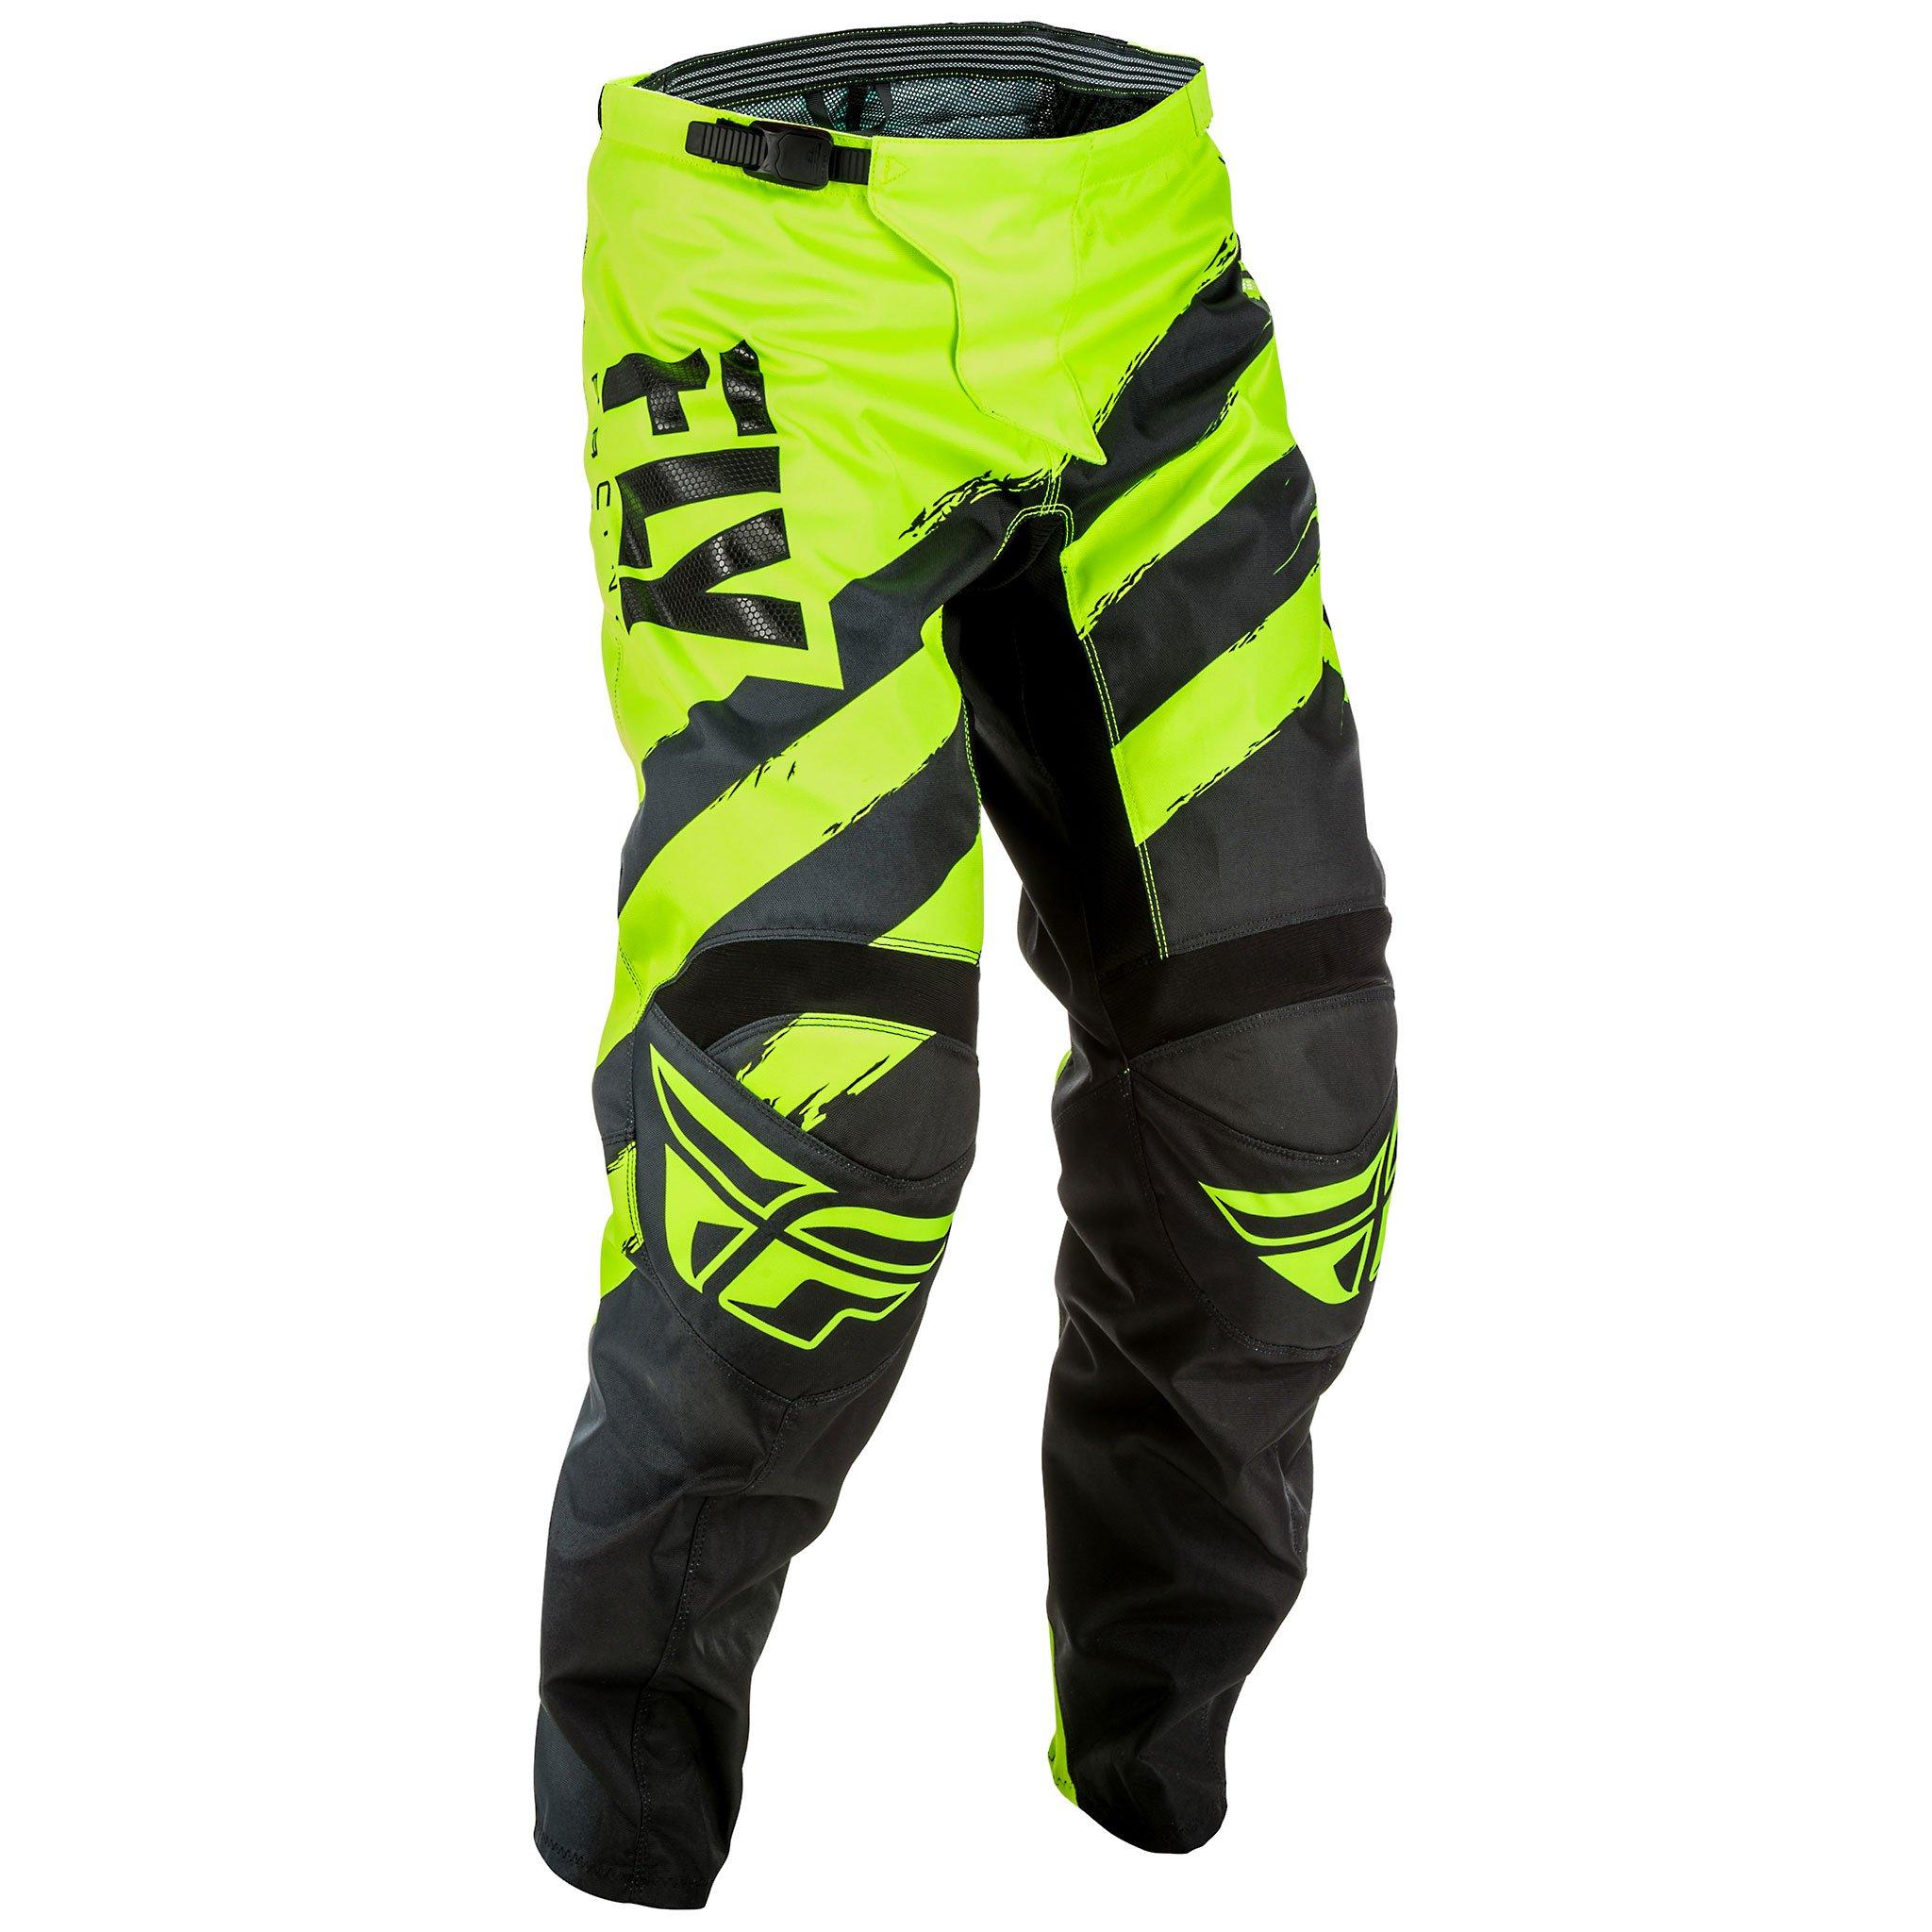 Fly Racing Men's Pants (Black/Hi-Vis, Size 36)